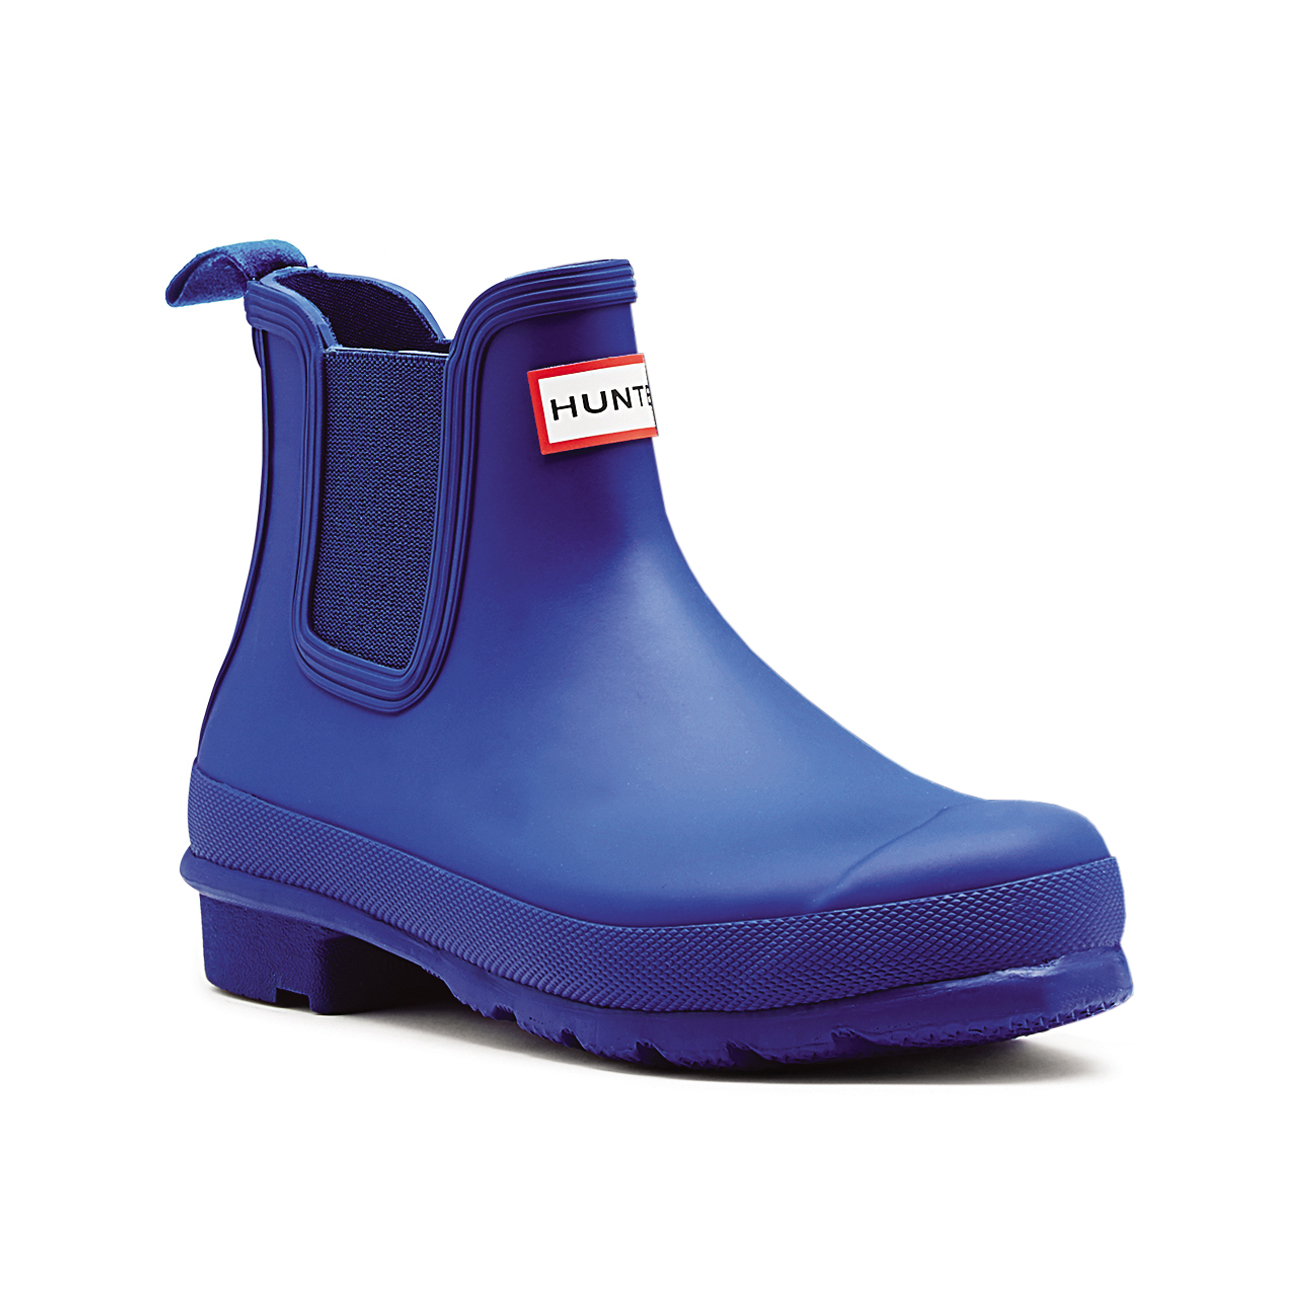 Hunter Original Ladies Waterproof Clogs Size 3-9